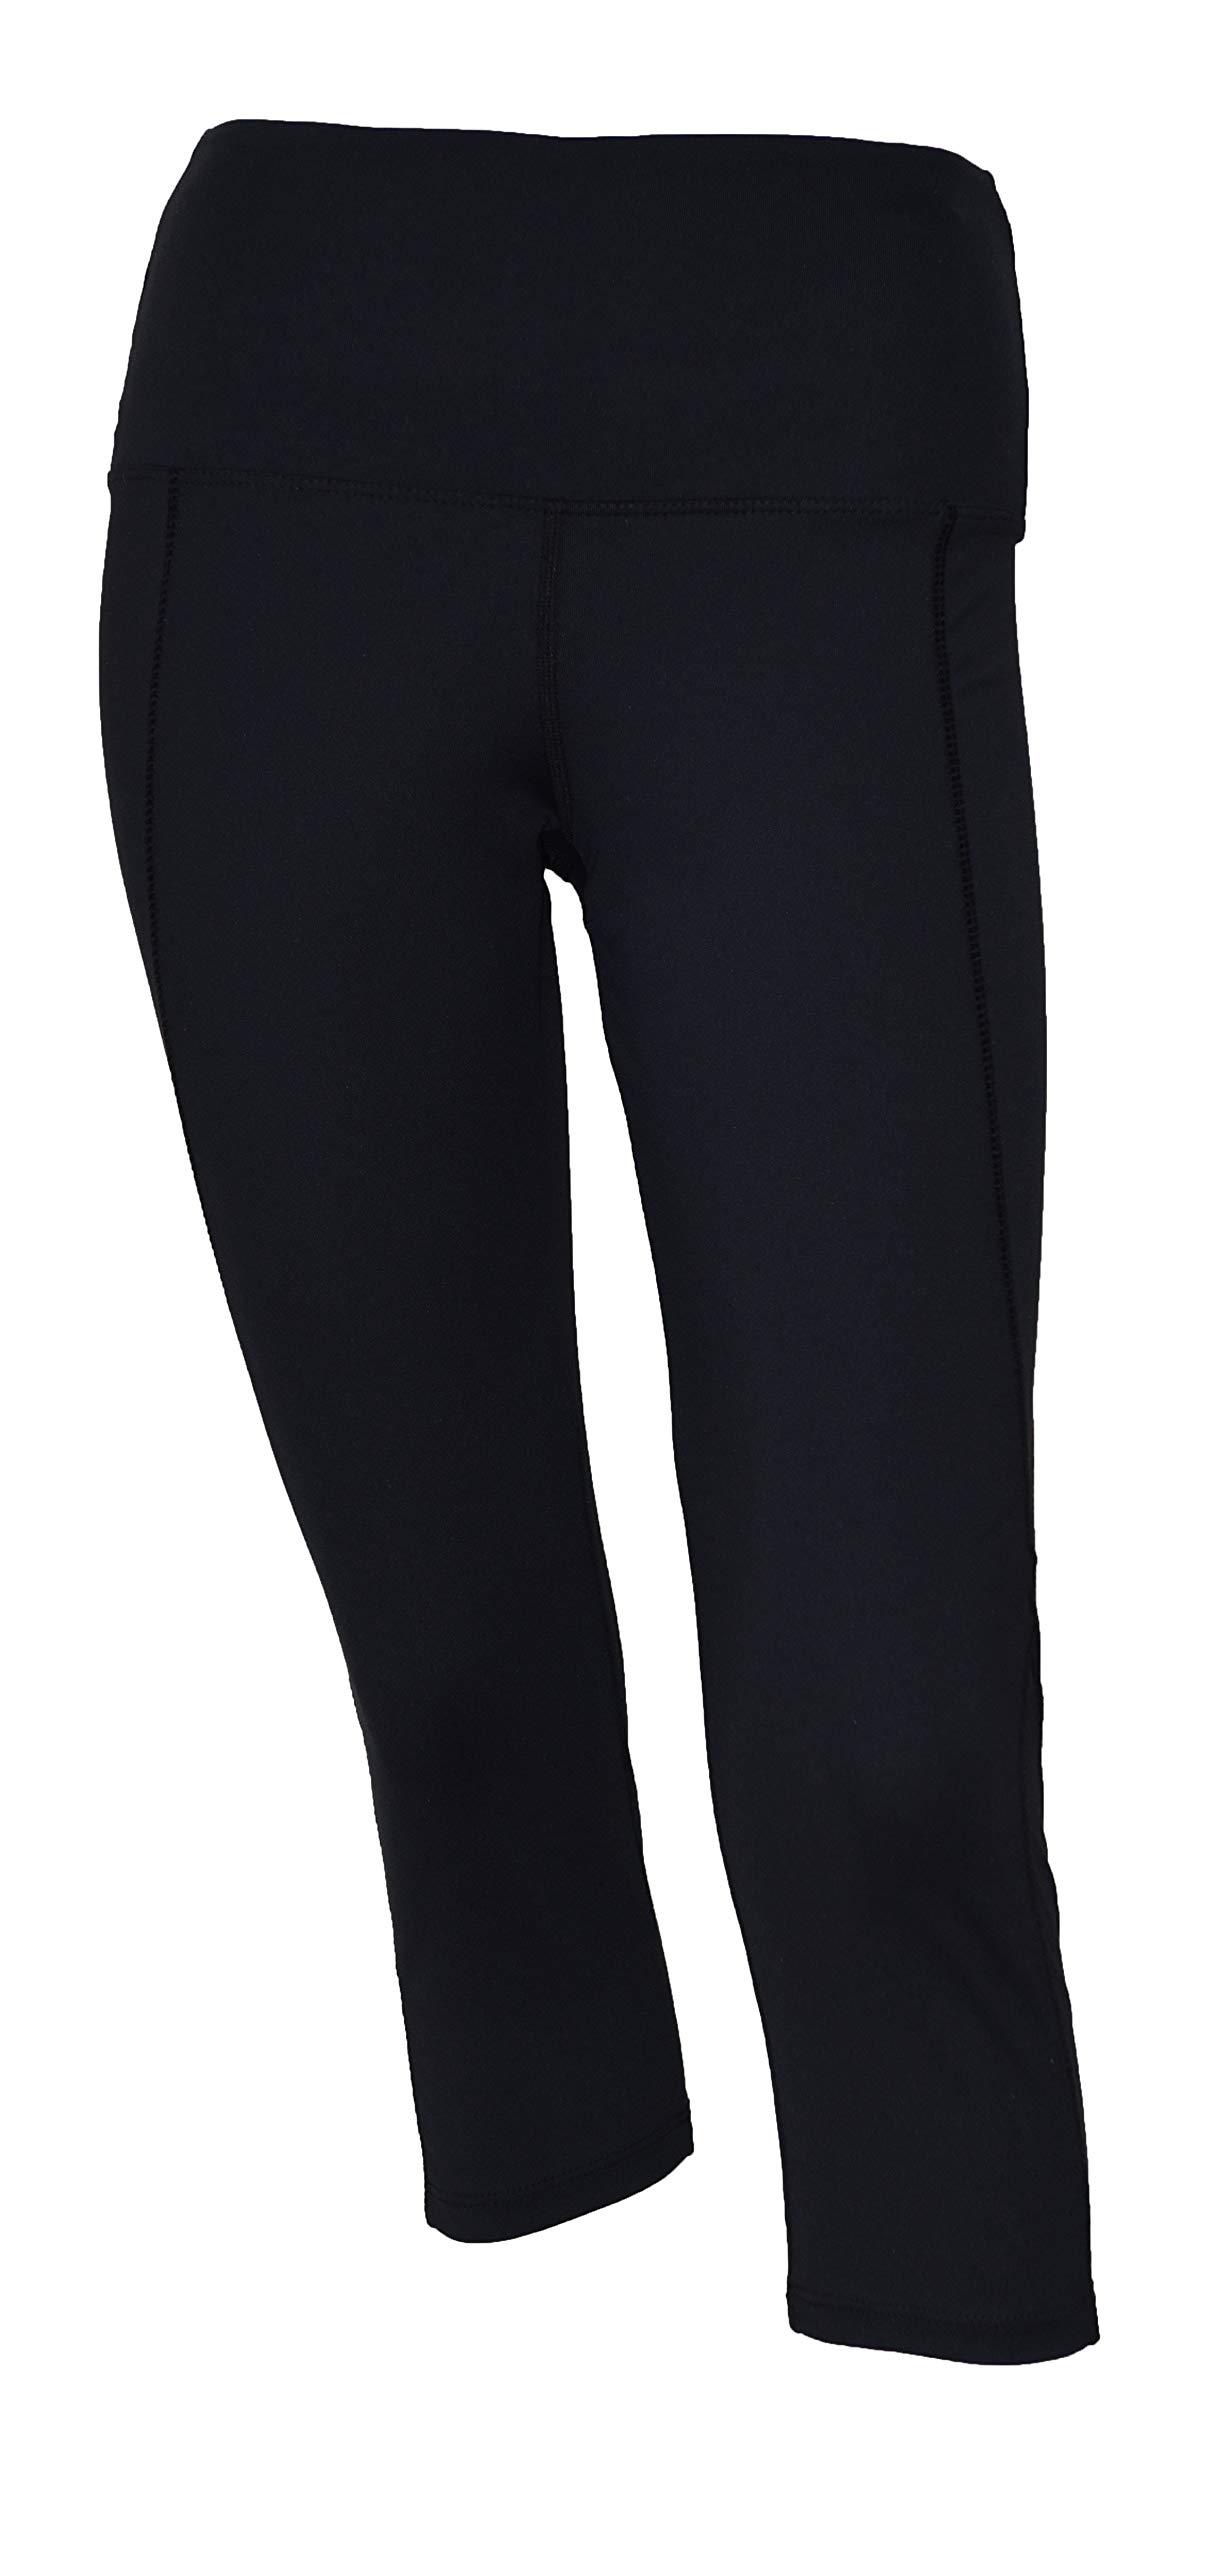 Private Island Women UV Swim Rash Guard Capri Pocket Pants Yoga (M, Black) by Private Island